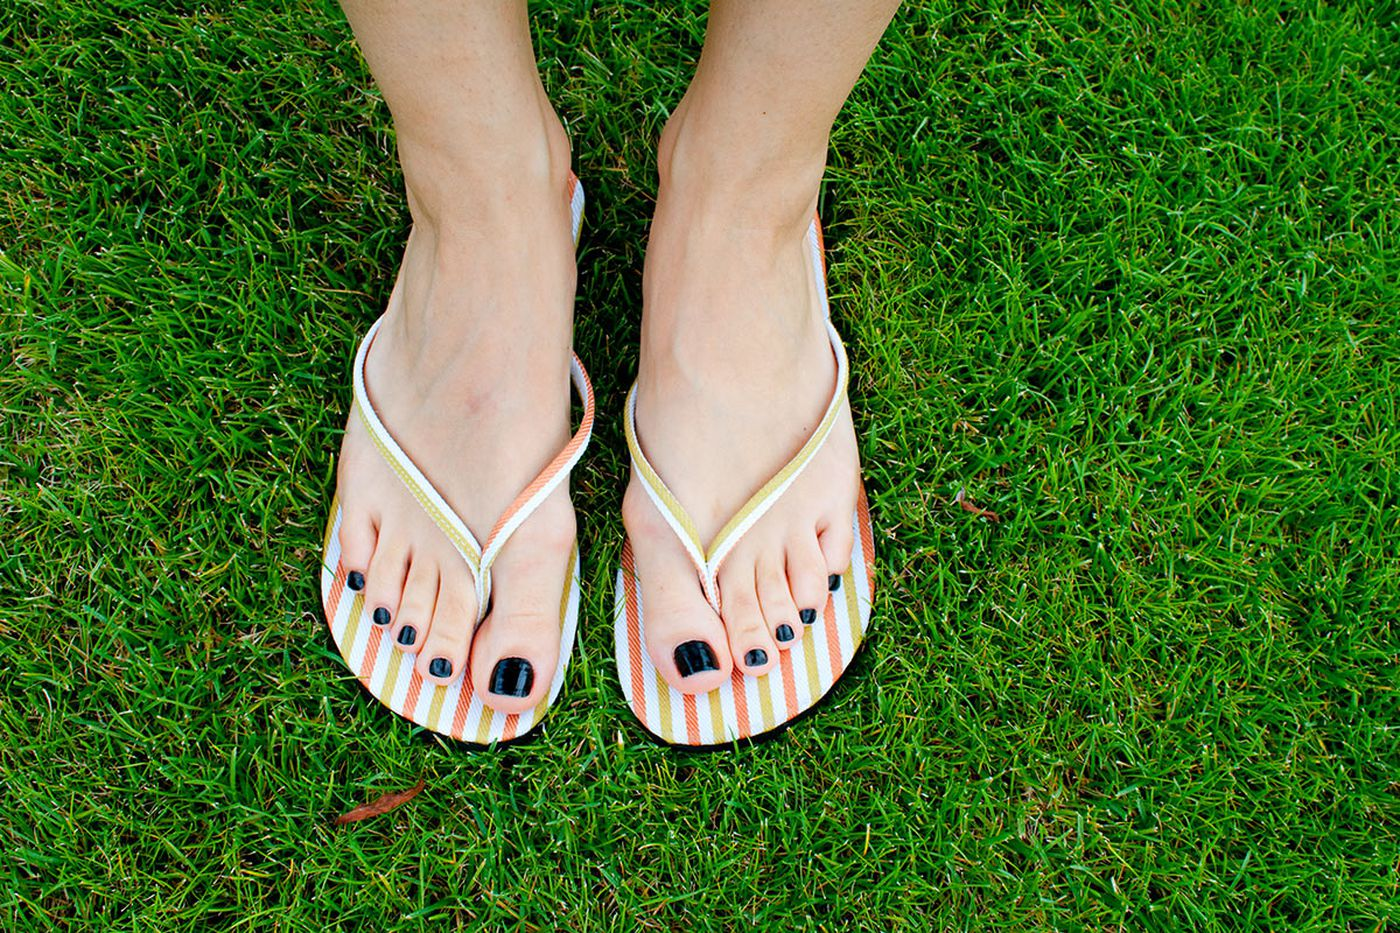 The serious dangers of flip flops